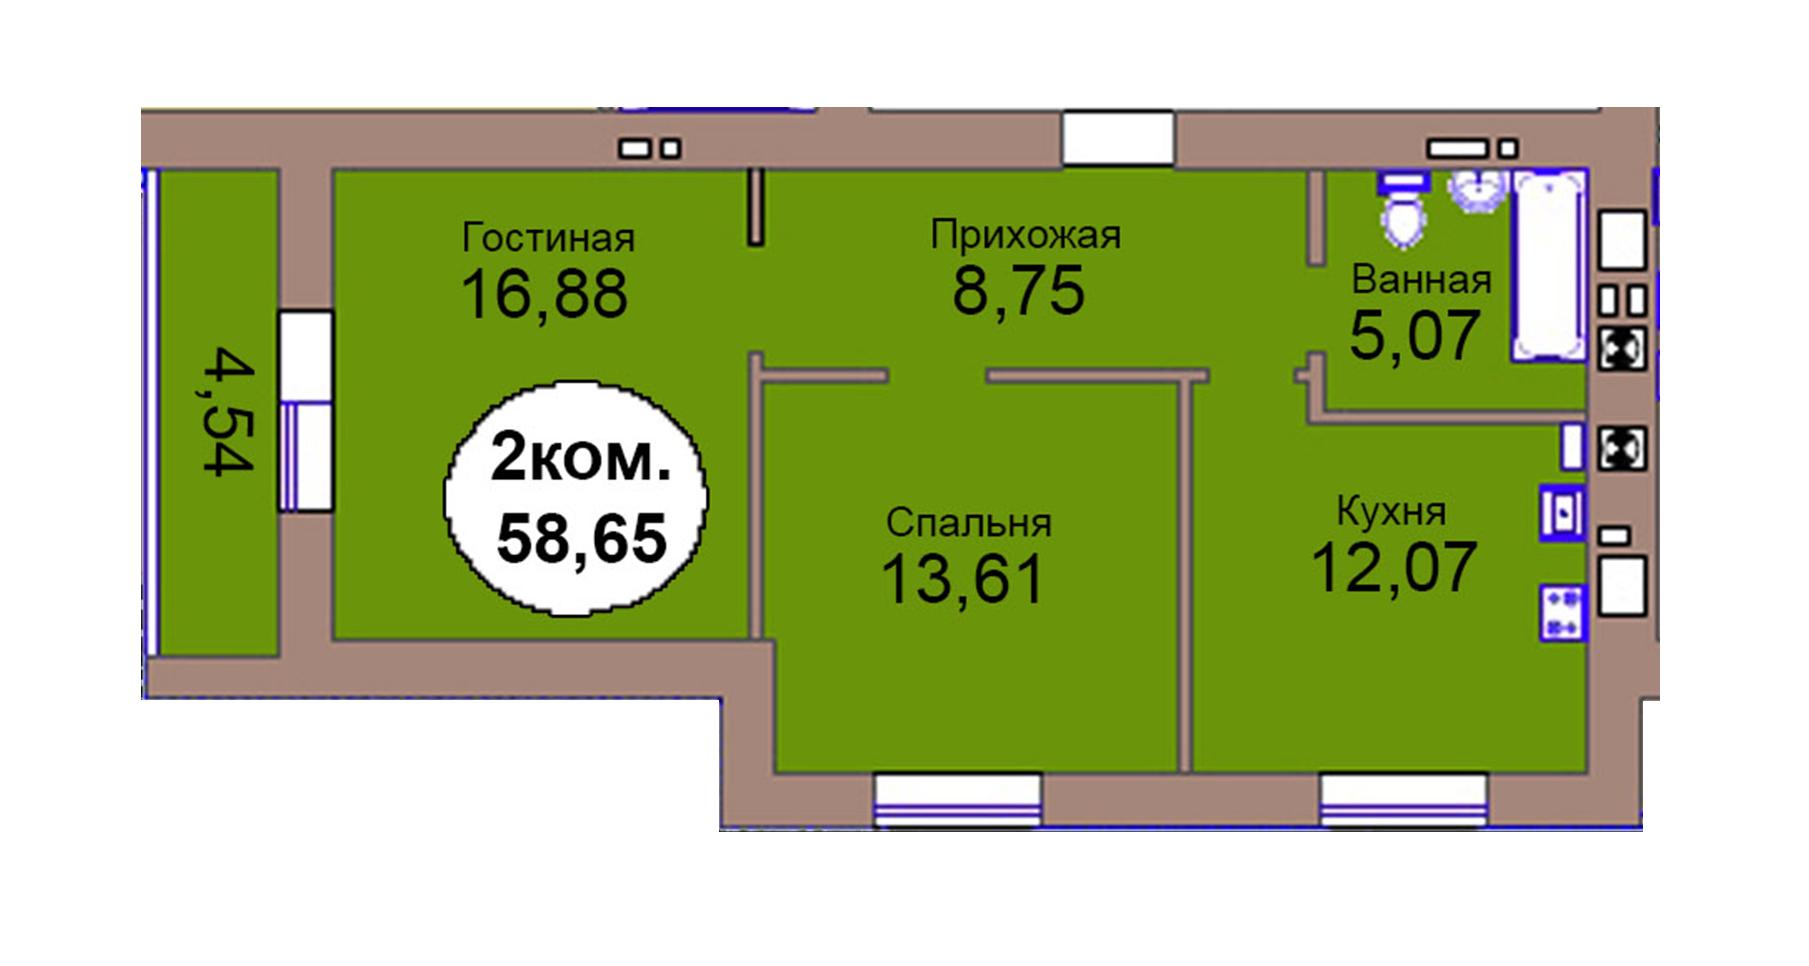 2-комн. кв. по пер. Калининградский, 4  кв. 116 в Калининграде